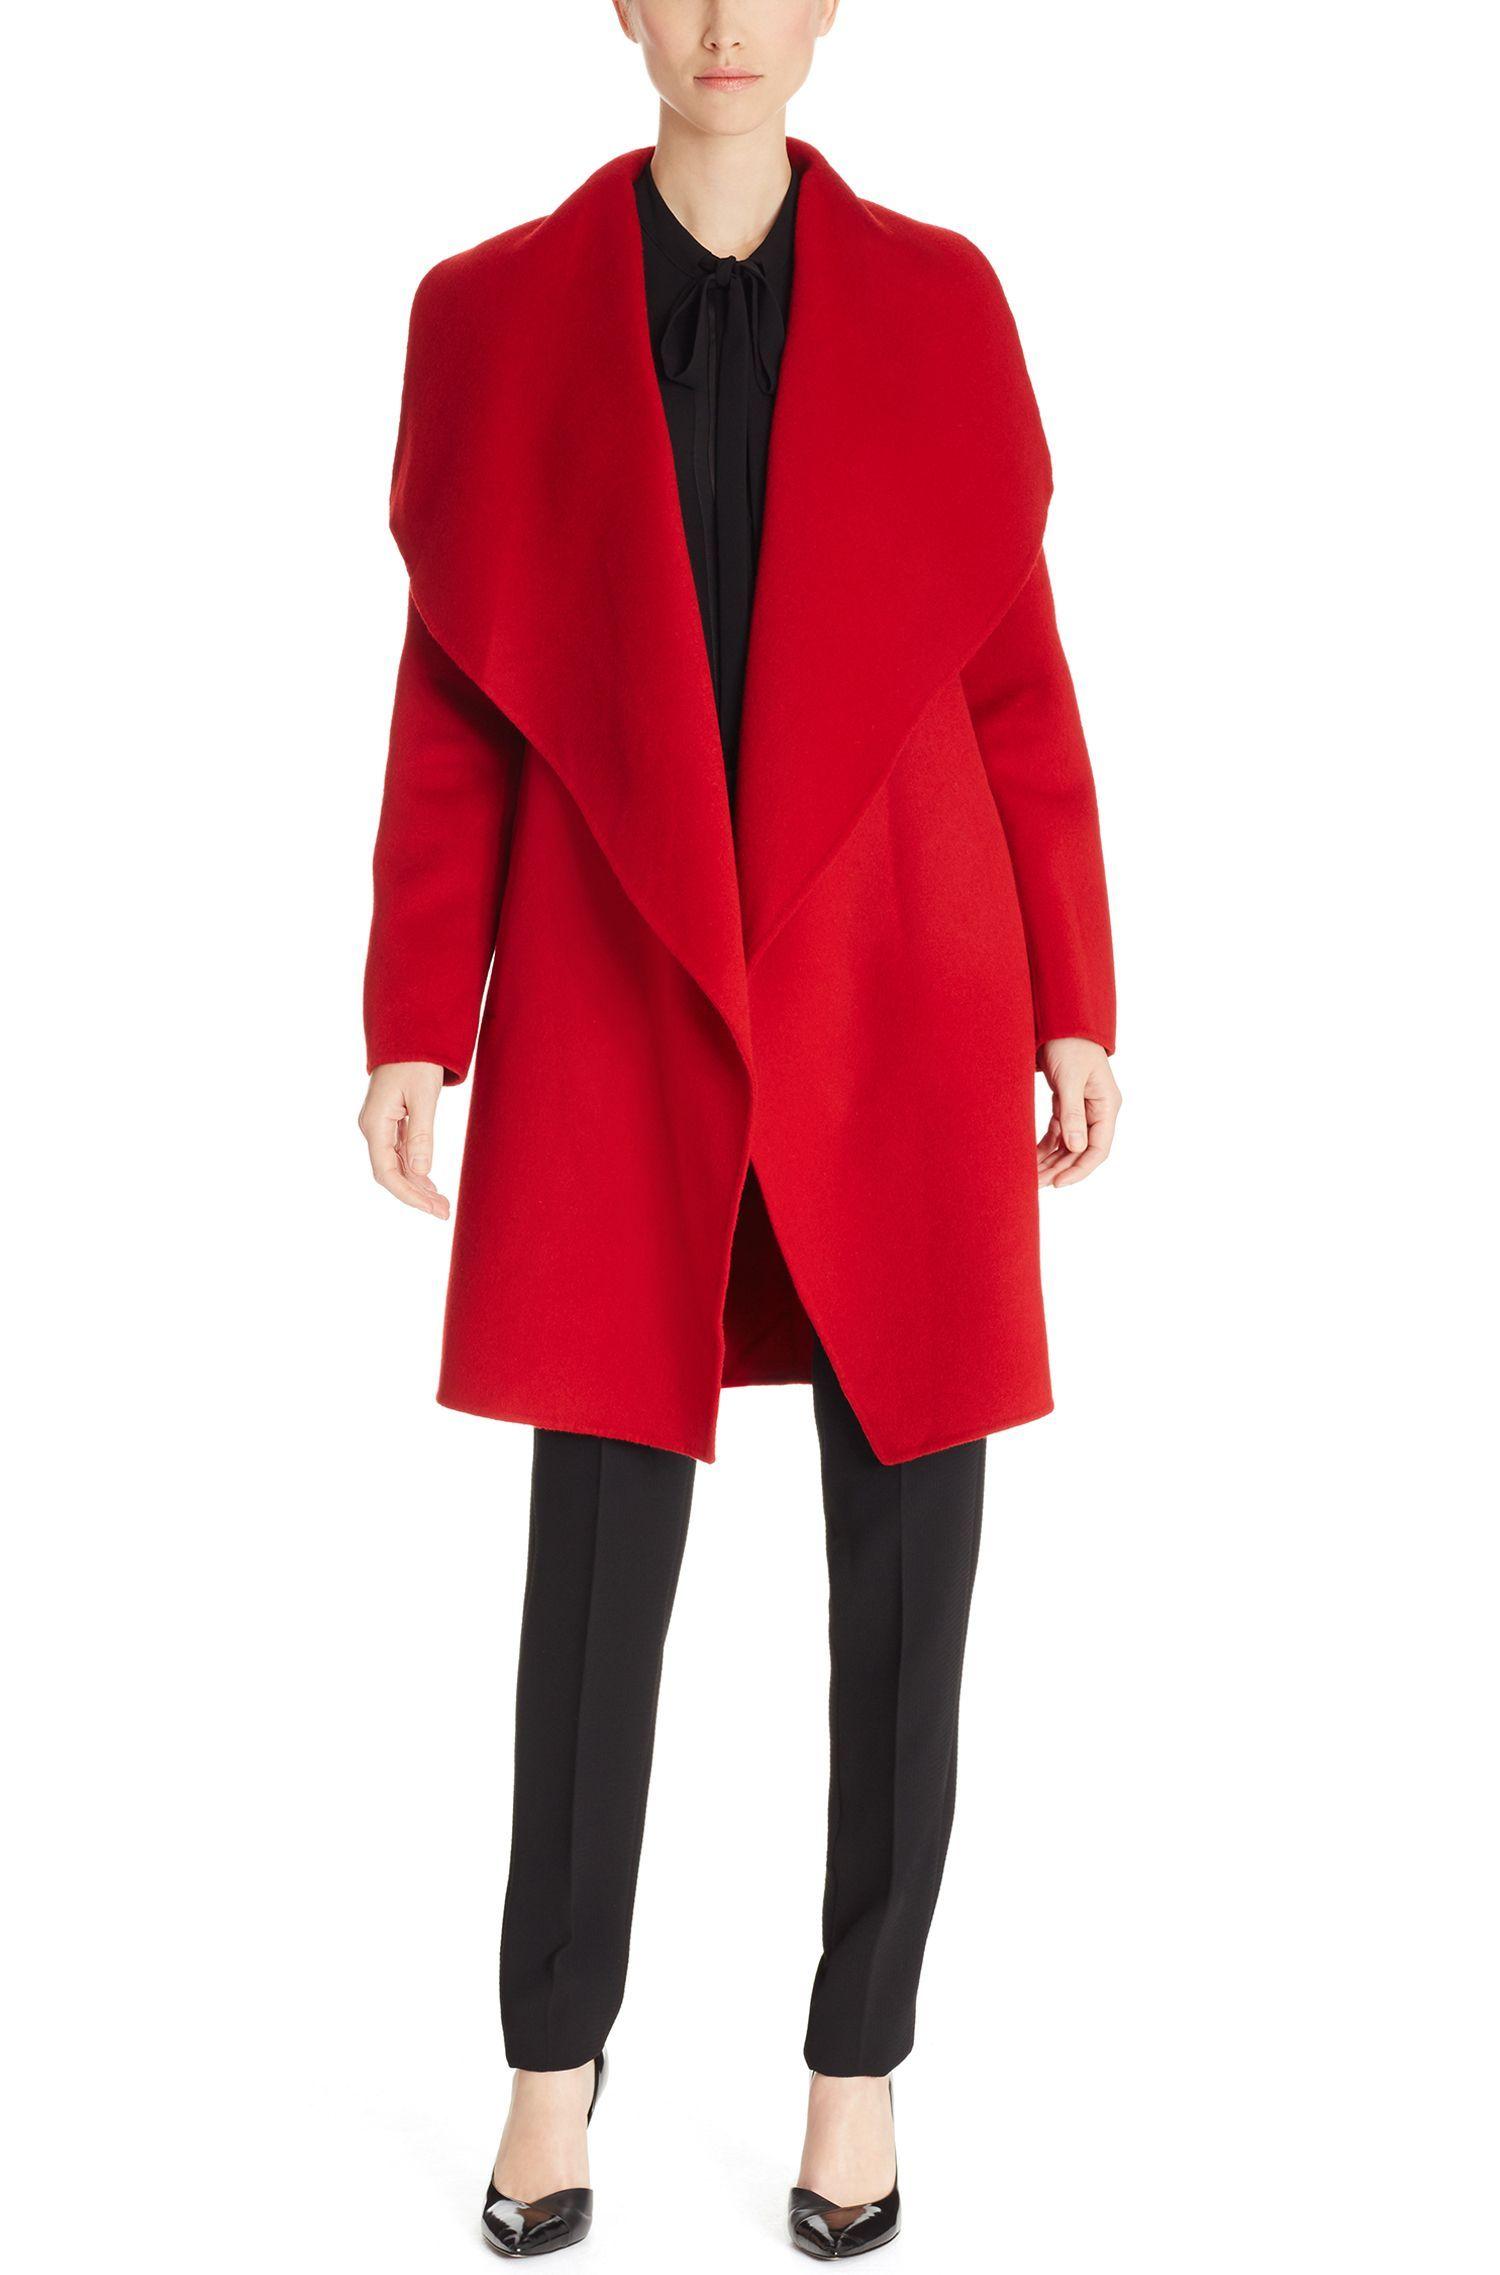 'Catifa' | Wool Cashmere Shawl Collar Coat, Red. Cashmere ShawlHugo BossWinter  ...